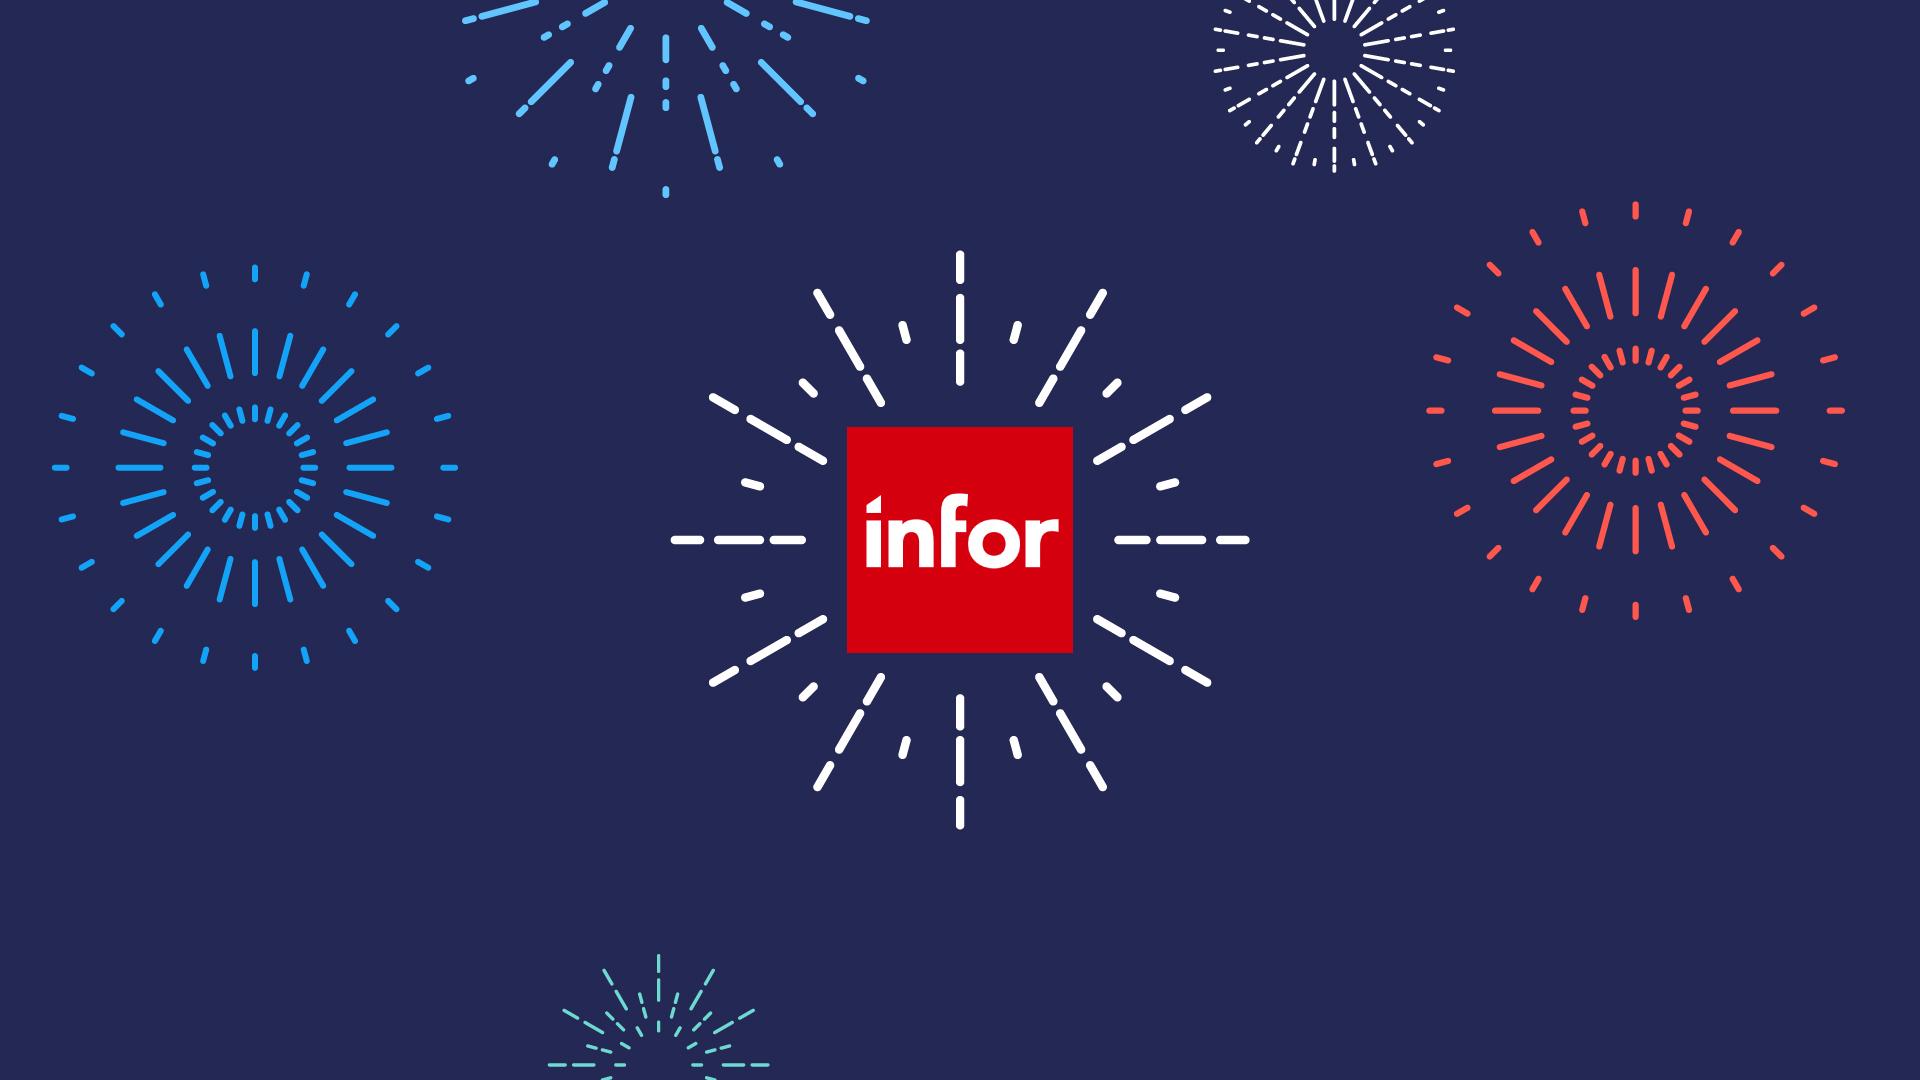 infor_holiday_card_plan_121716_MD.jpg